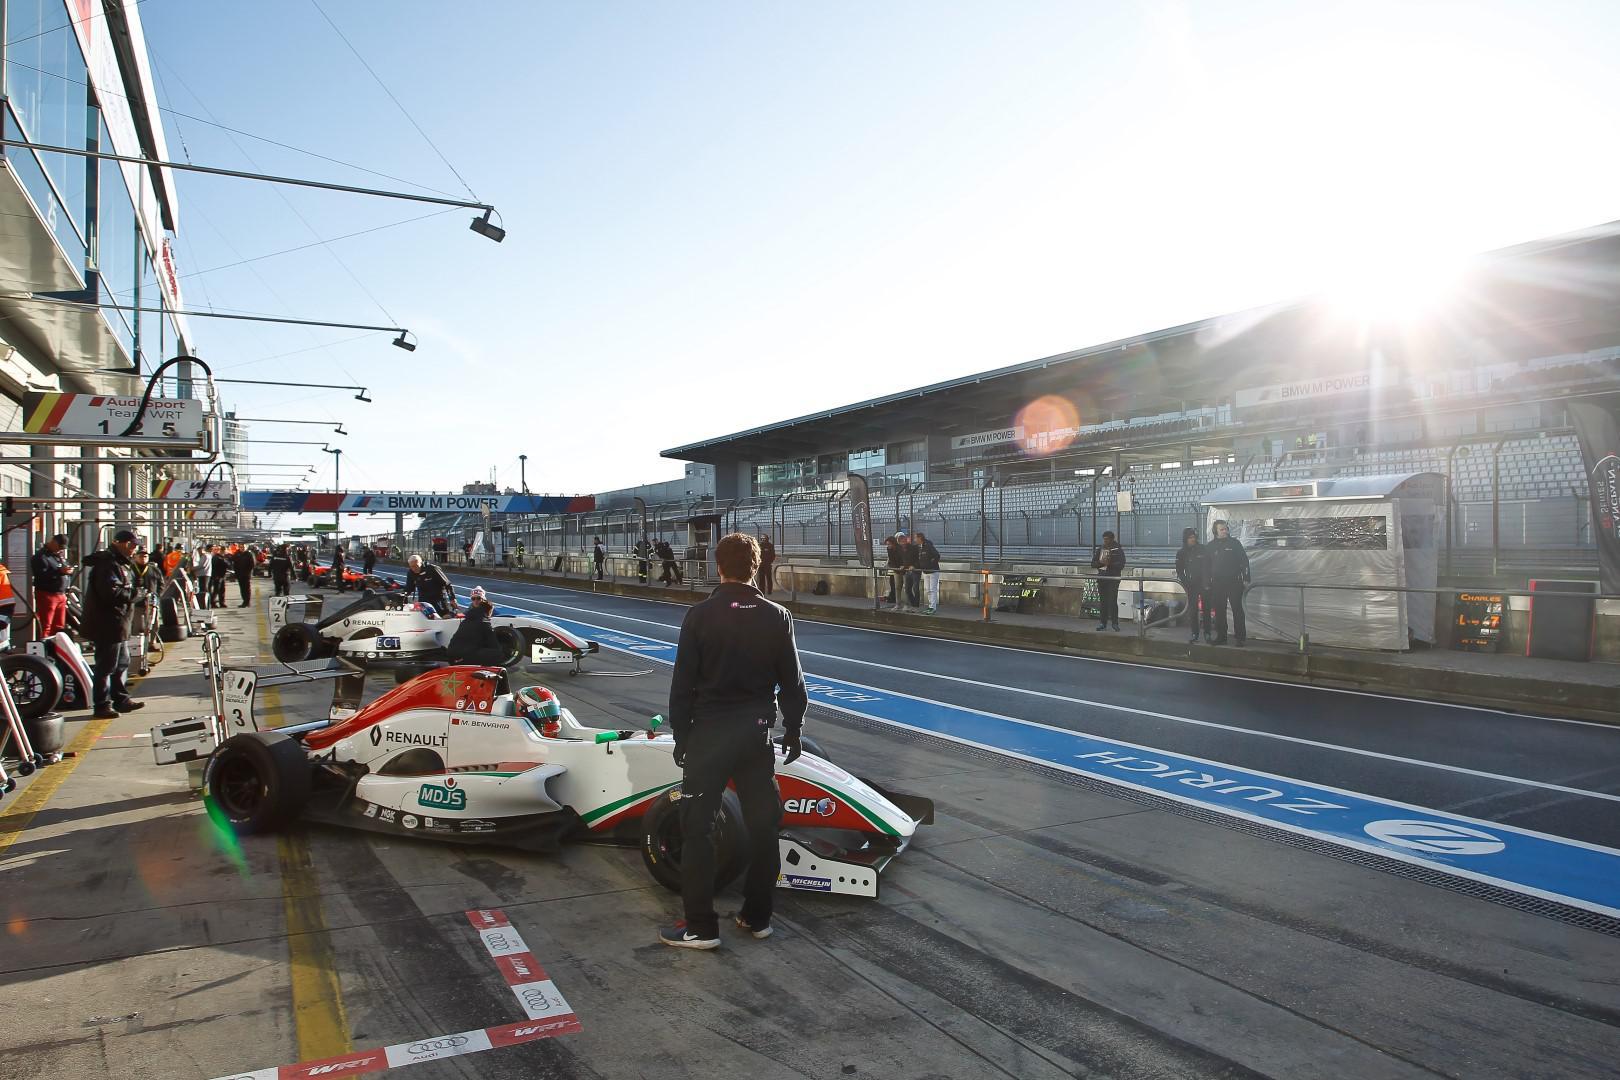 michael-benyahia-round-5-amp-6-championnat-nec-formule-renault-2-0-422-1.jpg